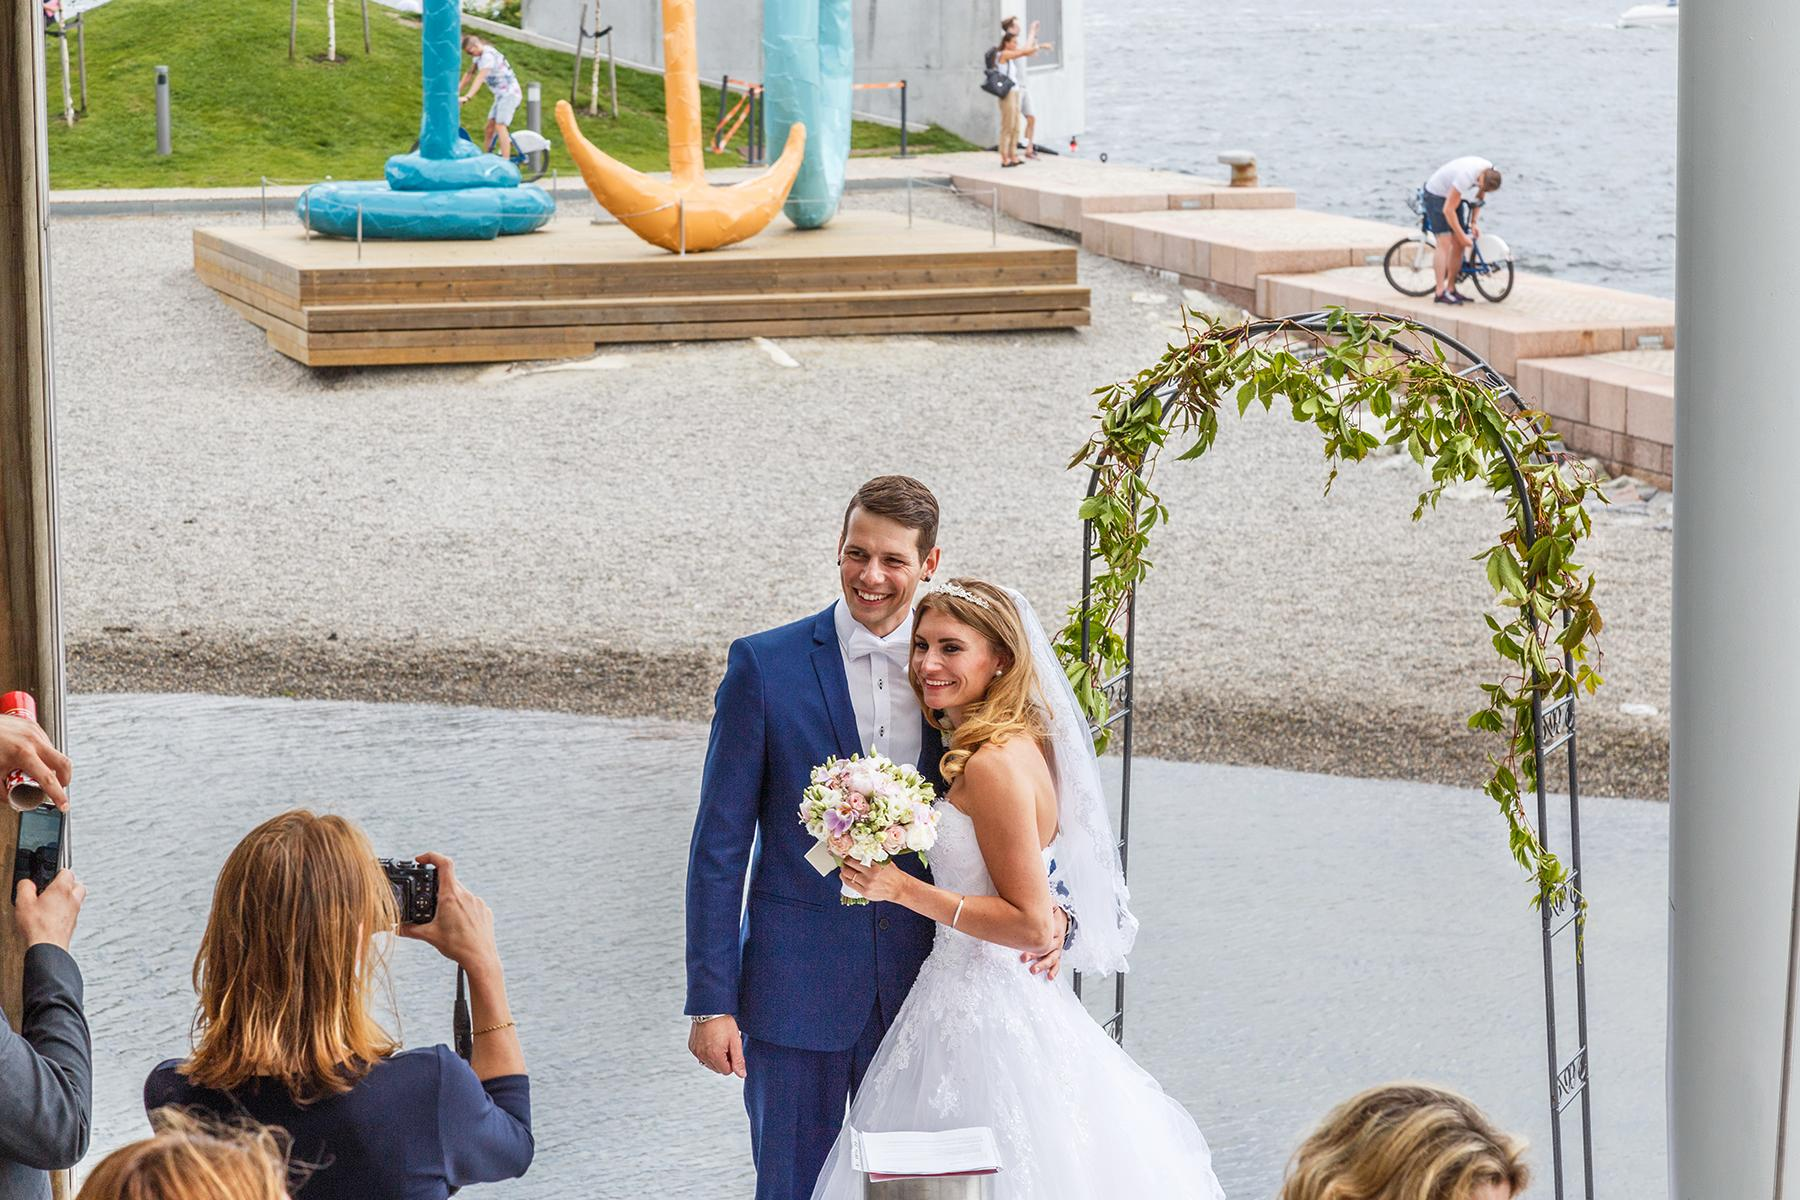 10 Extremely Strange Wedding Traditions Around The World: Wedding Traditions Around The World